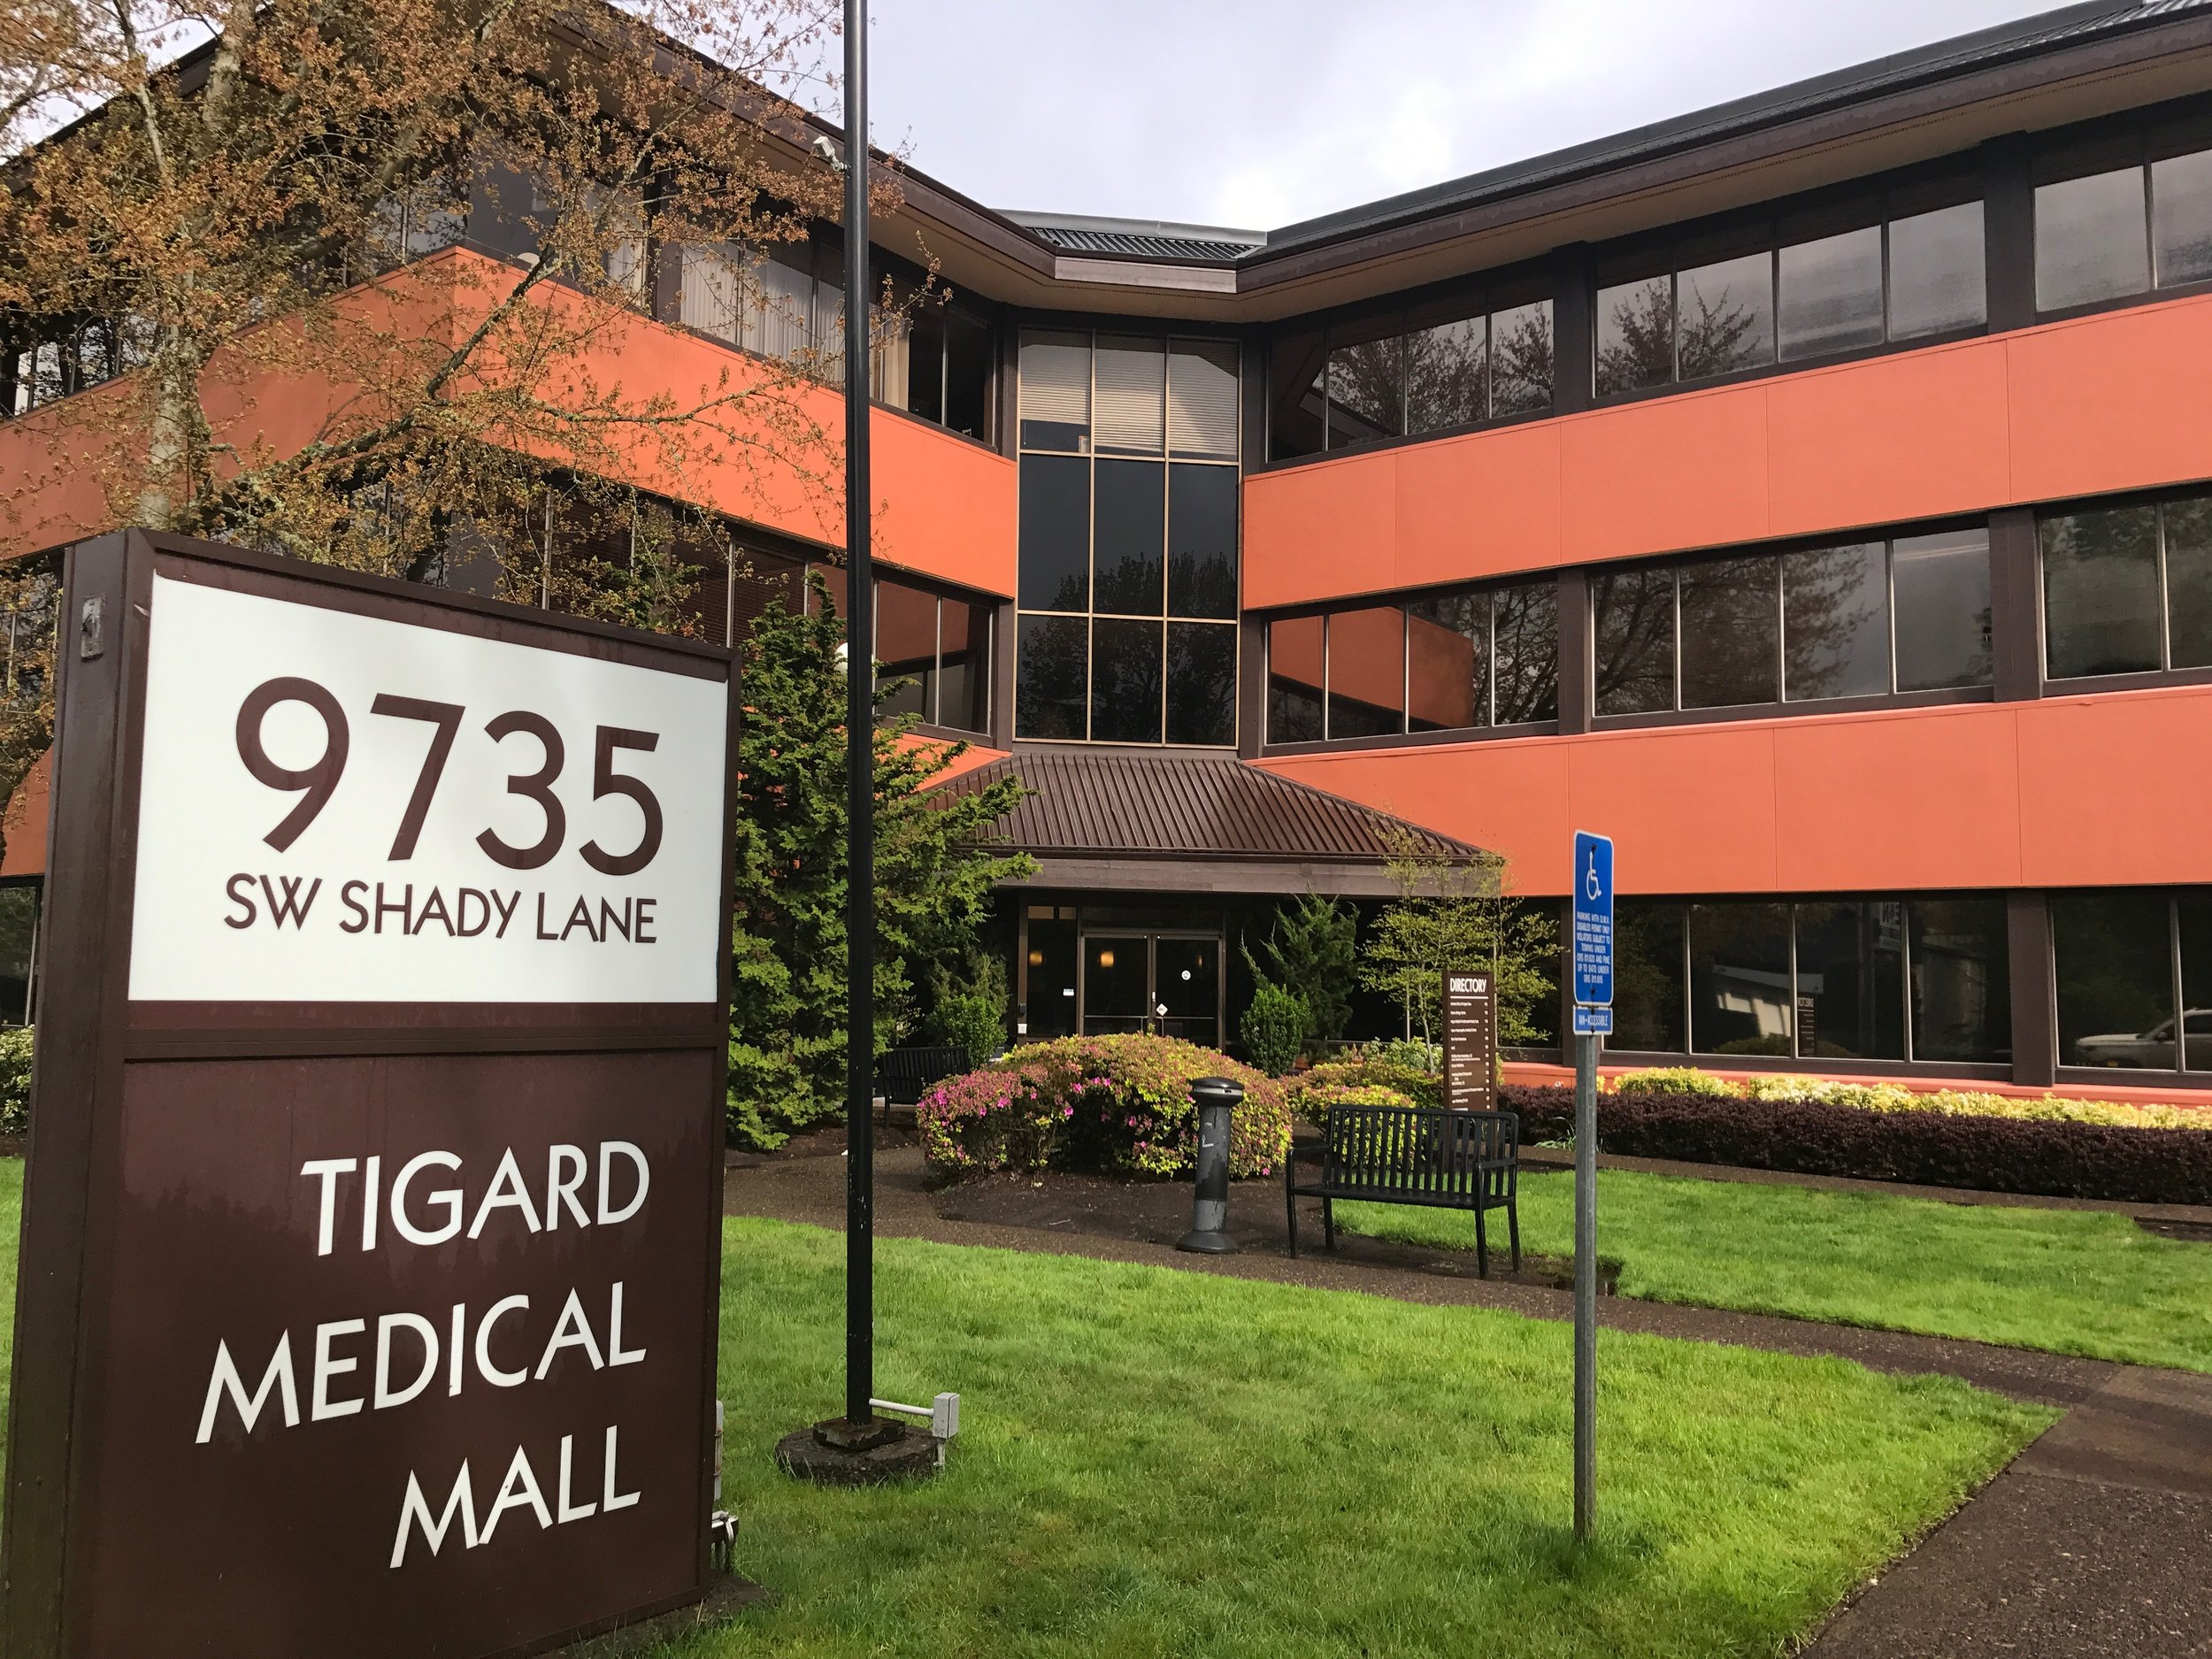 Tigard Medical Mall